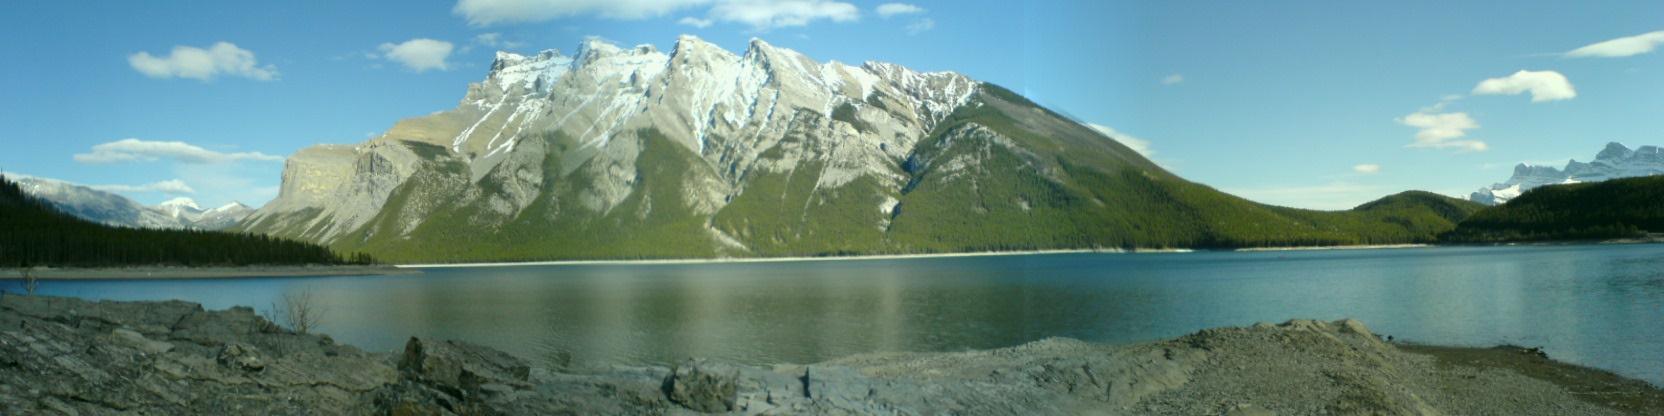 Berge in den Rockie Mountains